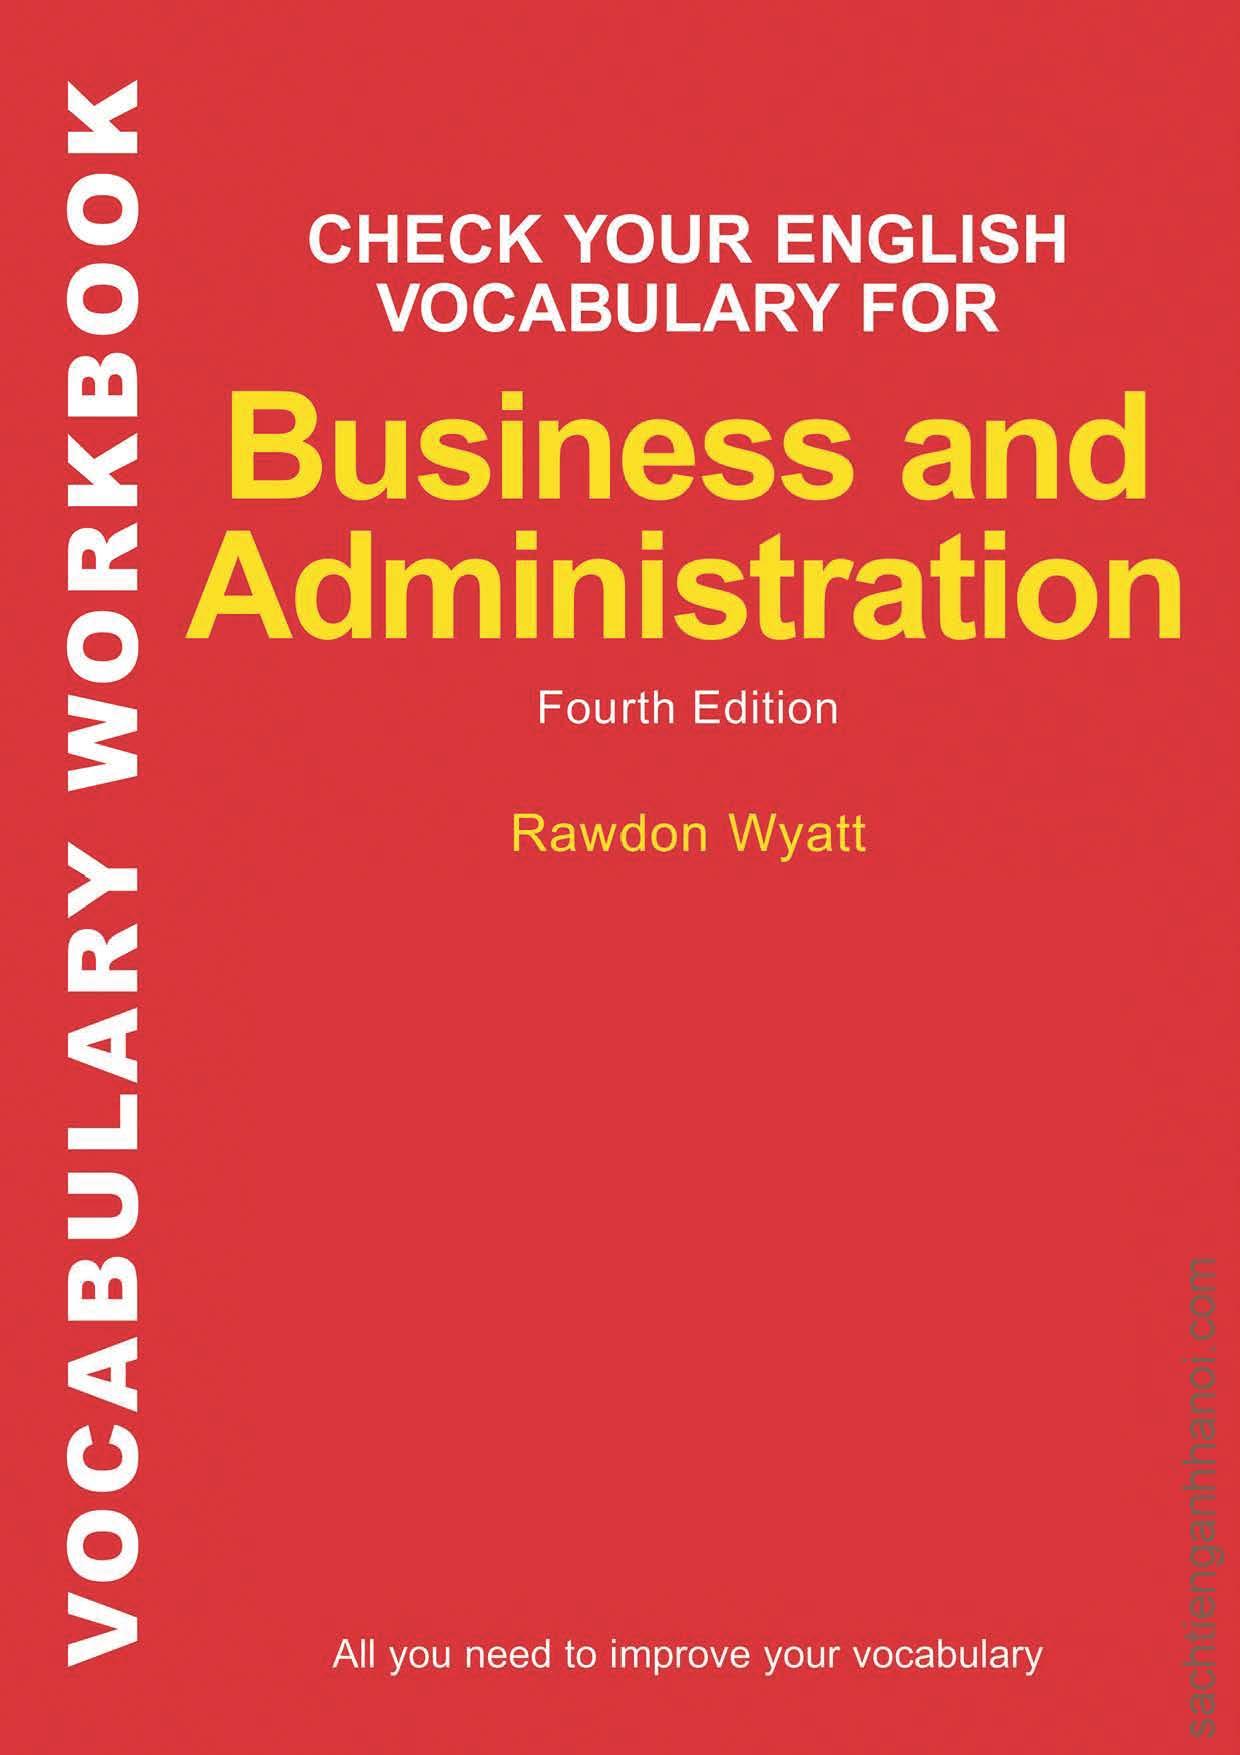 Sách] Check Your English Vocabulary for Business and Administration (4th Edition) – Sách gáy xoắn - SÁCH TIẾNG ANH HÀ NỘI